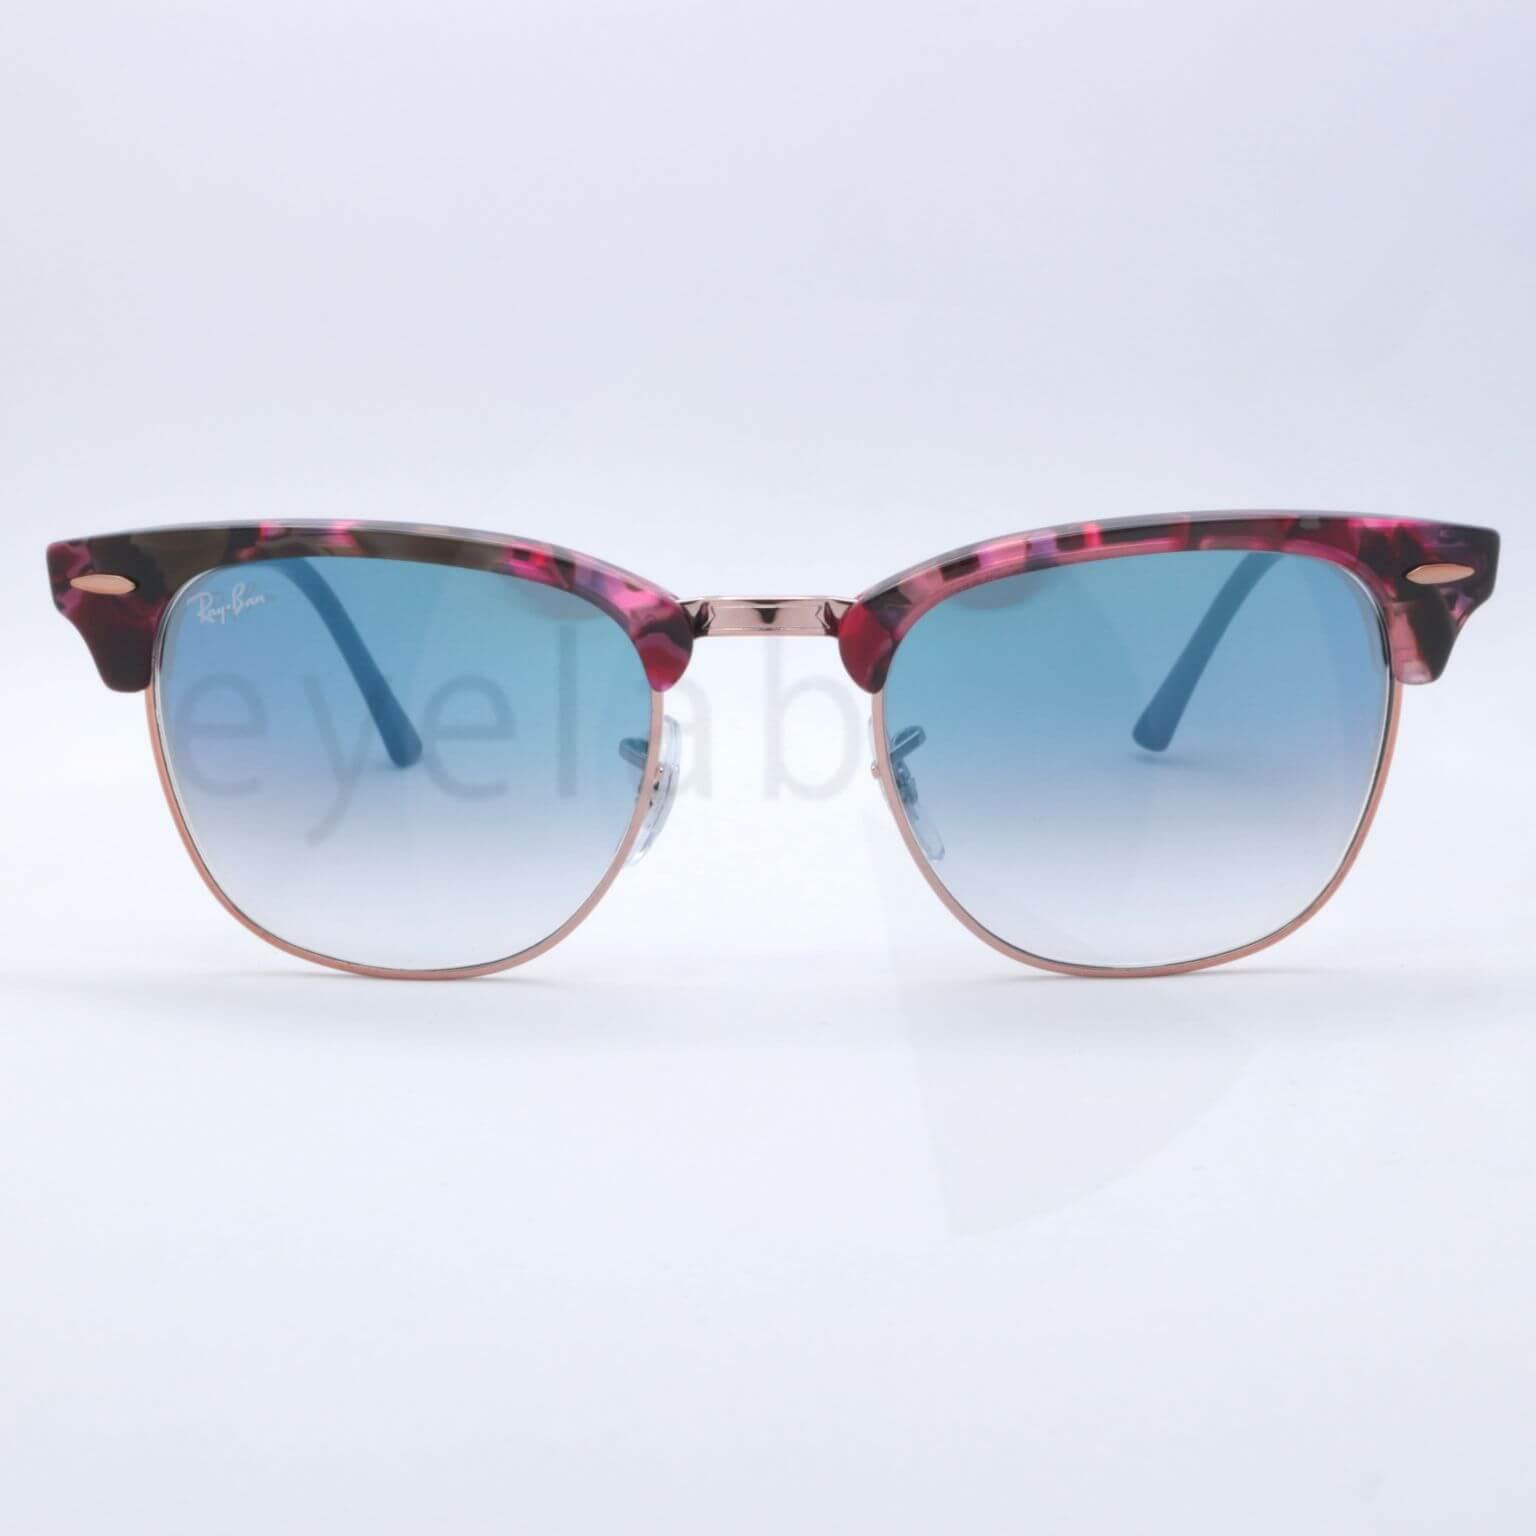 019650205bc78 Ray-Ban 3016 Clubmaster 12573F 51 sunglasses ~ Οπτικά Eyelab